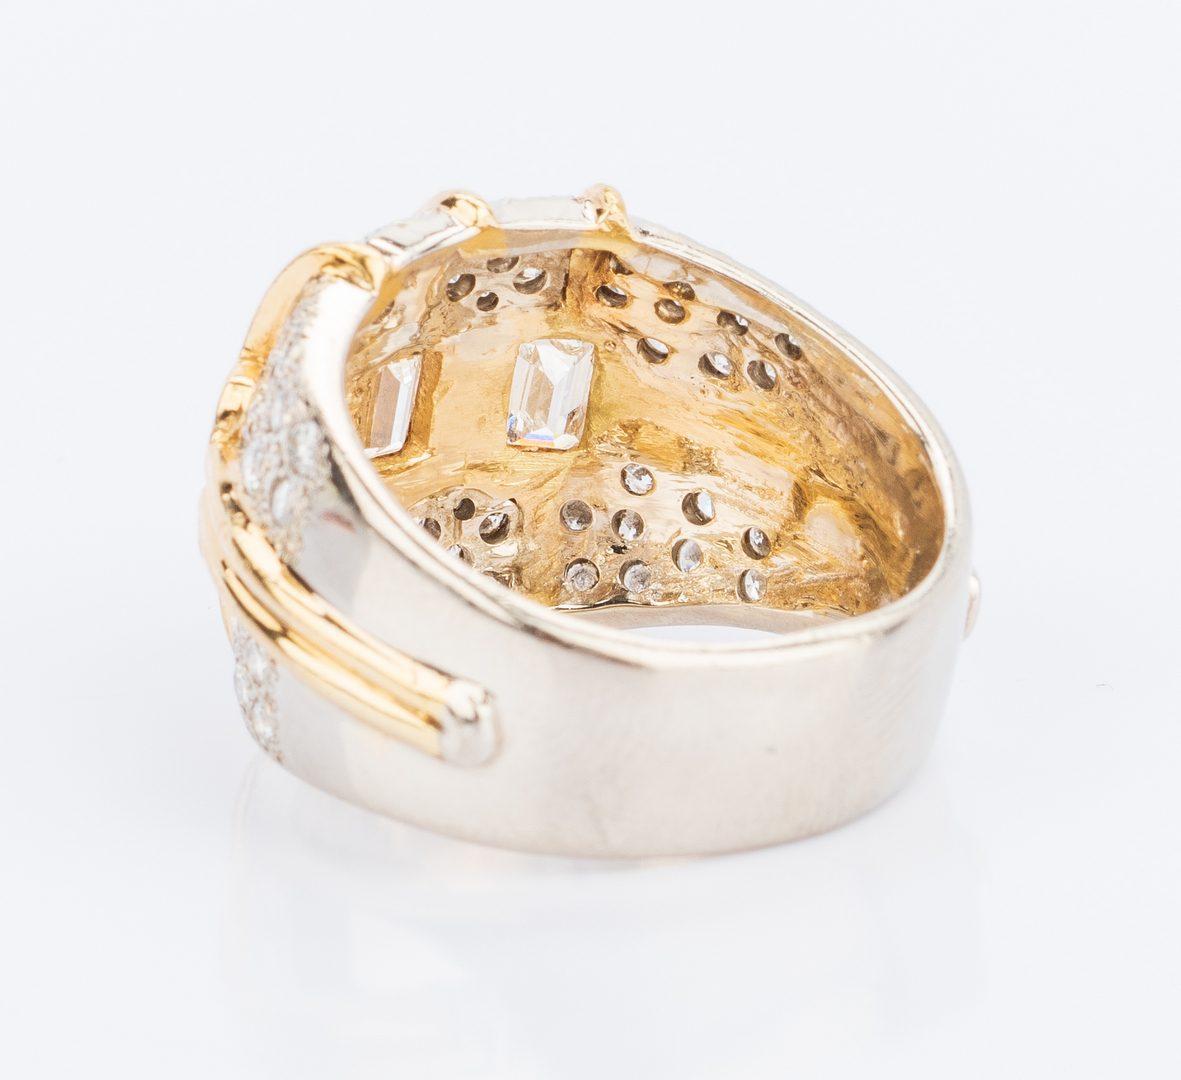 Lot 37: 14K/18K Gold Diamond Fashion Ring